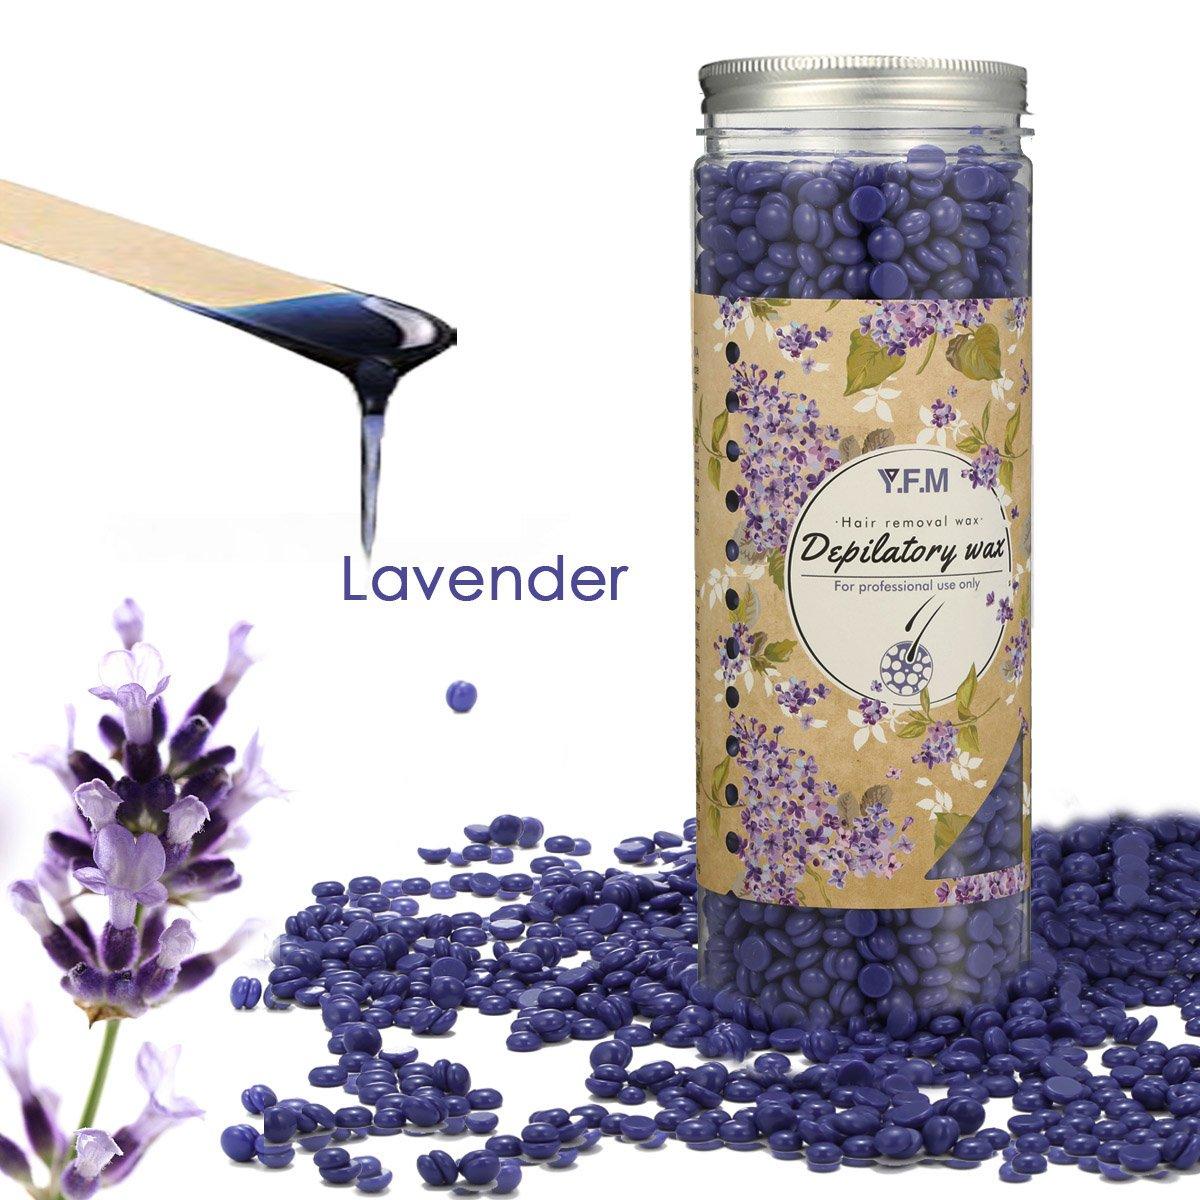 wachsbohnen, Luckyfine Lavendel ontharing wachsbohnen heisswachs voor genitale, poten, armen en gezicht ontharing